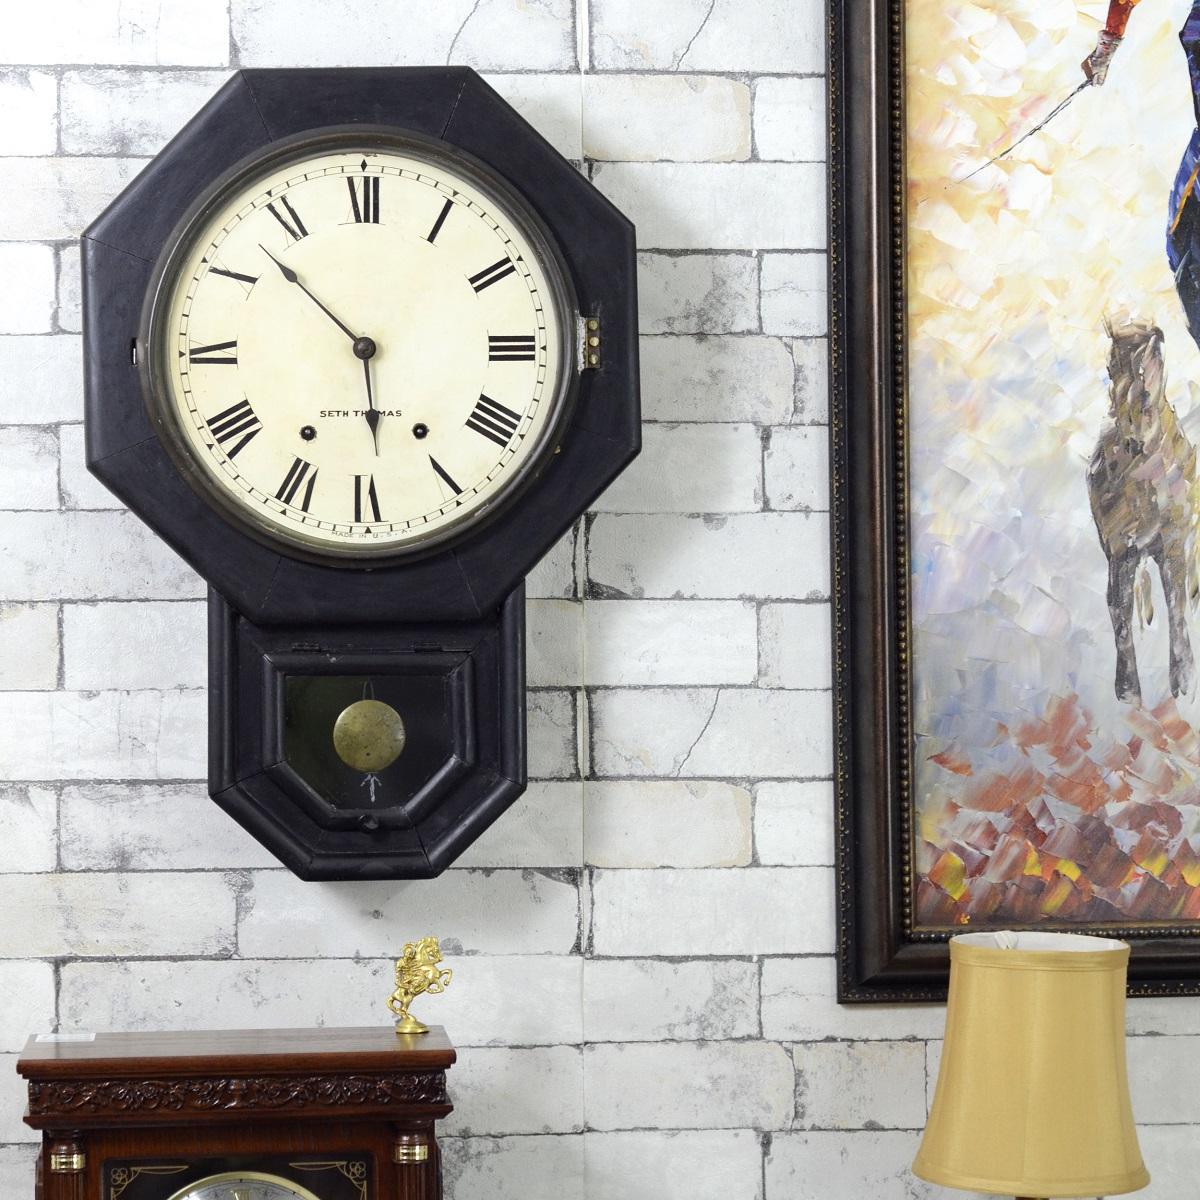 Antikcart Antique Real Seth Thomas Teakwood pendulum clock